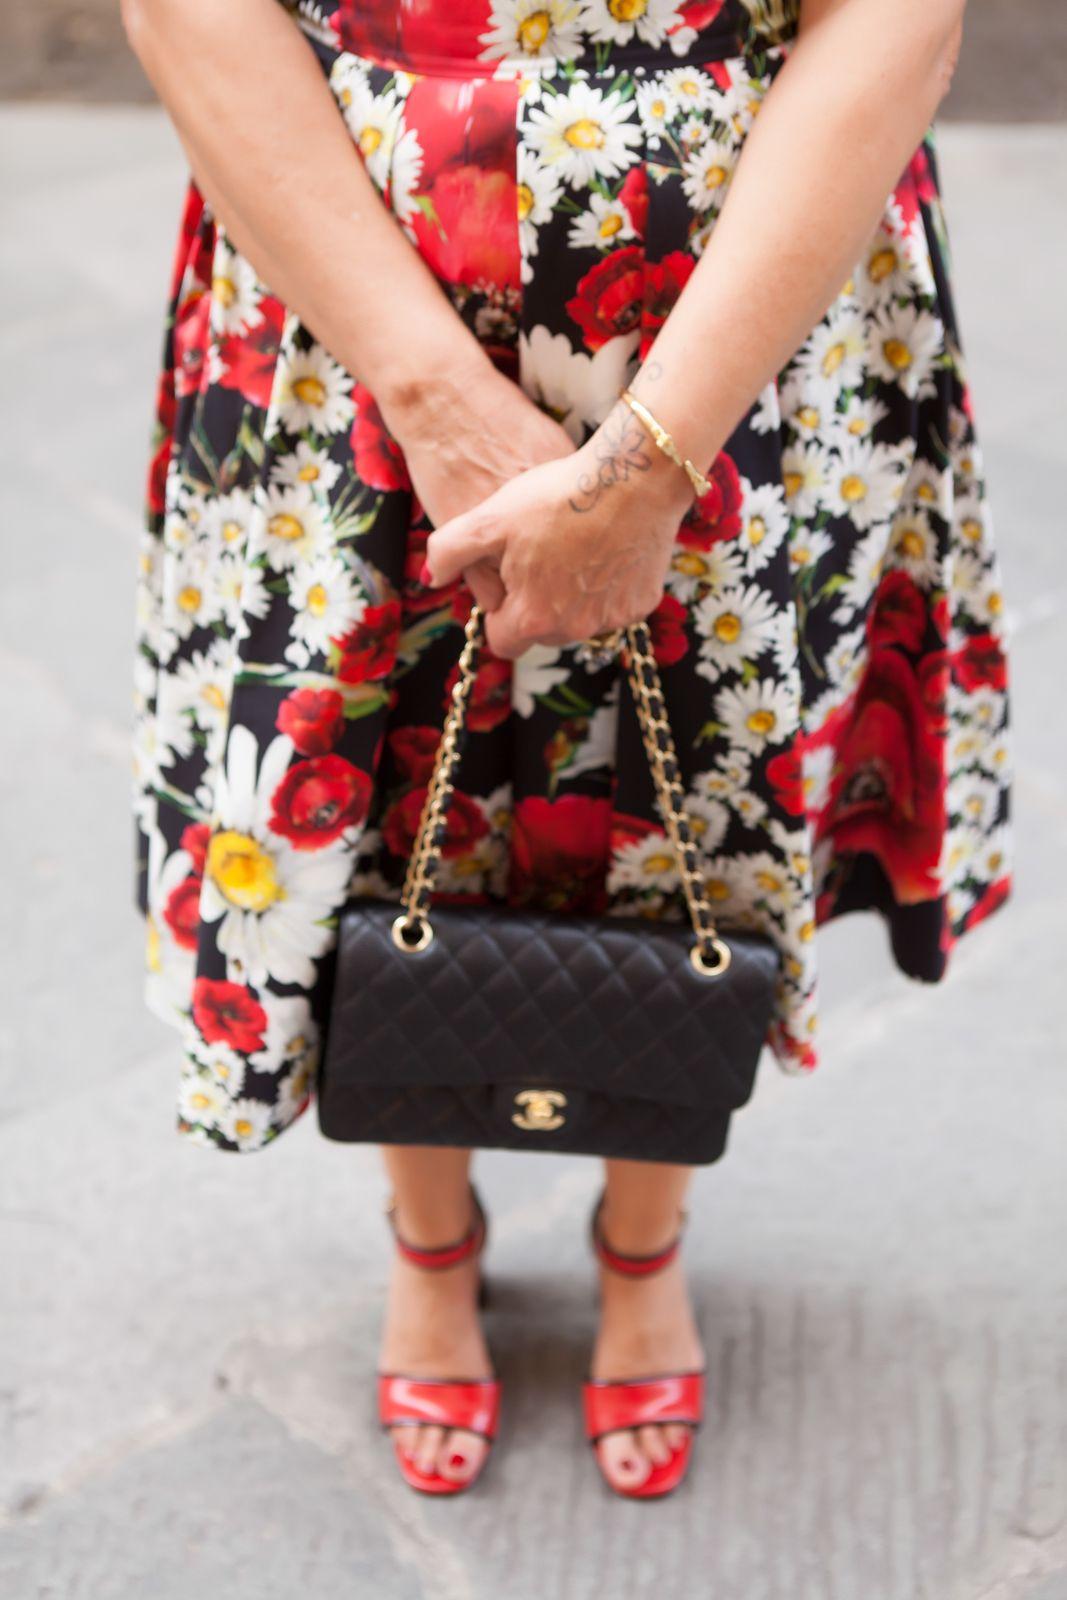 mani sandals, My dress is a flower garden - illesteva sunglasses, dolce gabbana flower dress, amle earrings, marni sandals. photo shooting in Siena - Not Only Twenty Fashion blog